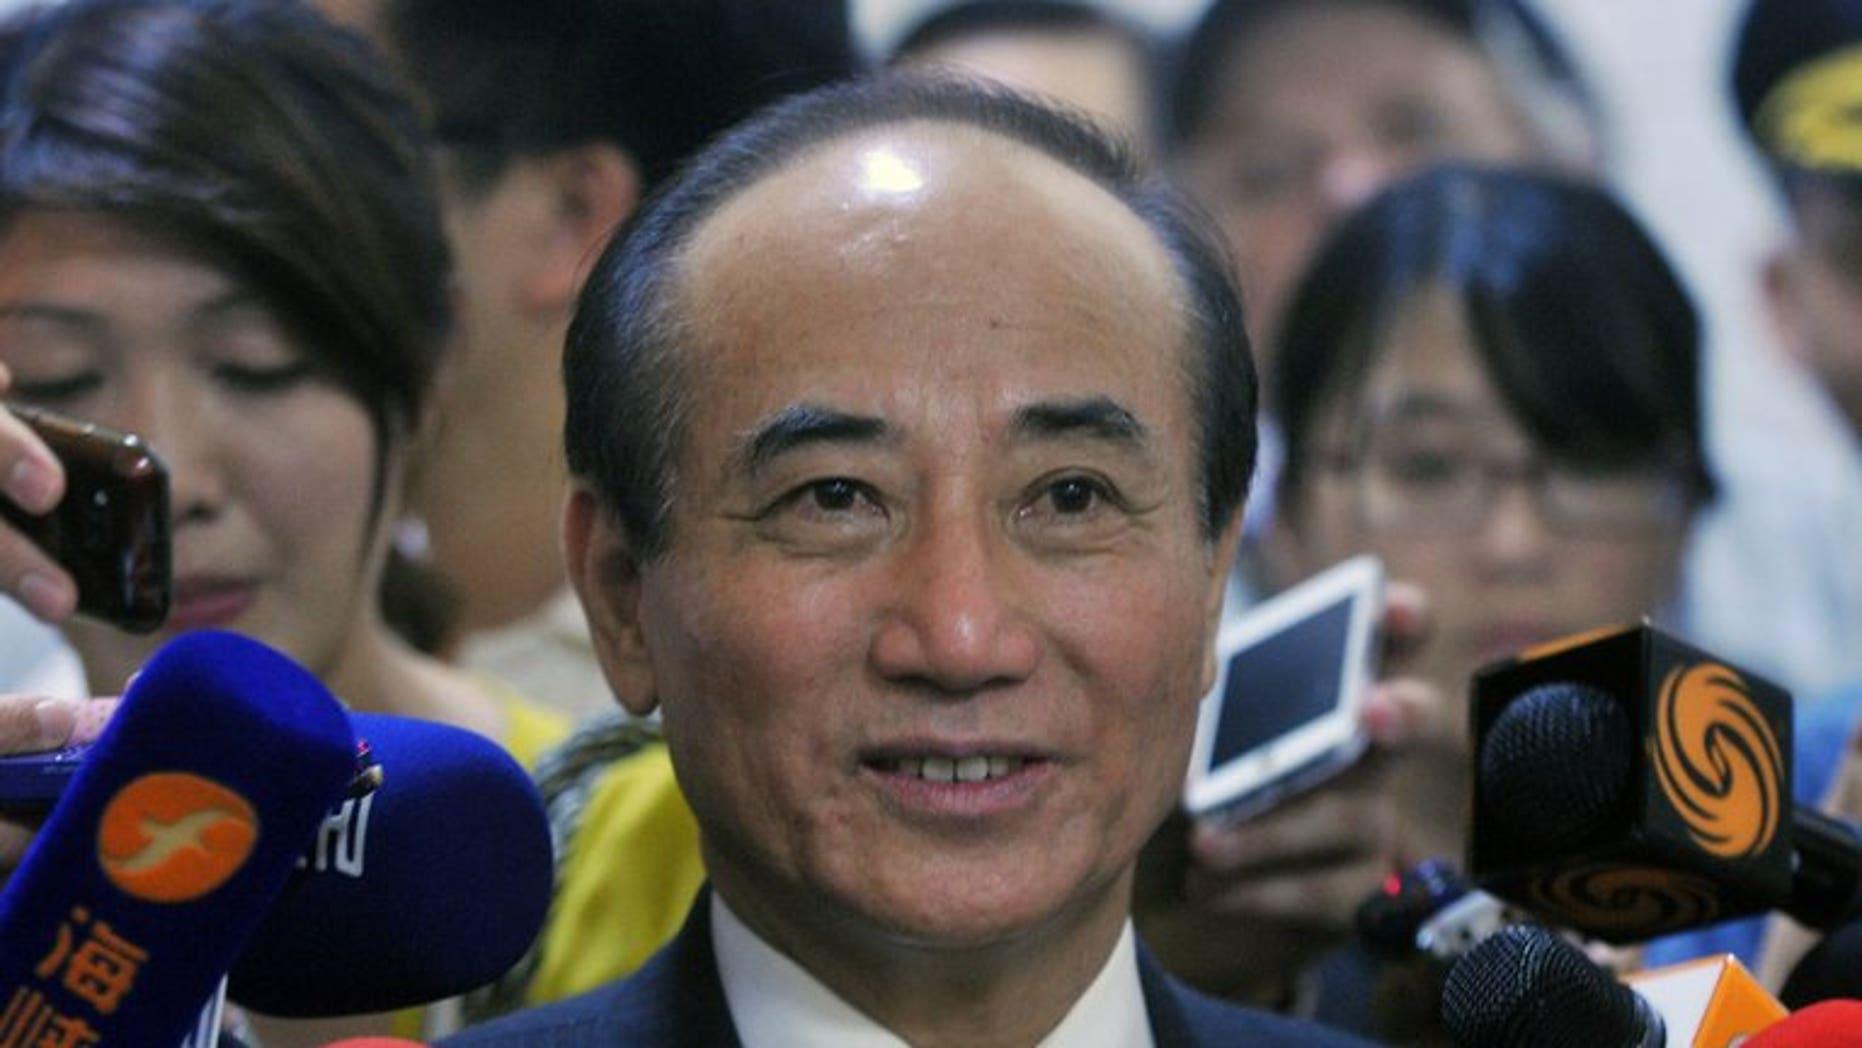 Taiwan's Legislative Speaker Wang Jin-pyng (C) speaks at parliament in Taipei on September 11, 2013.